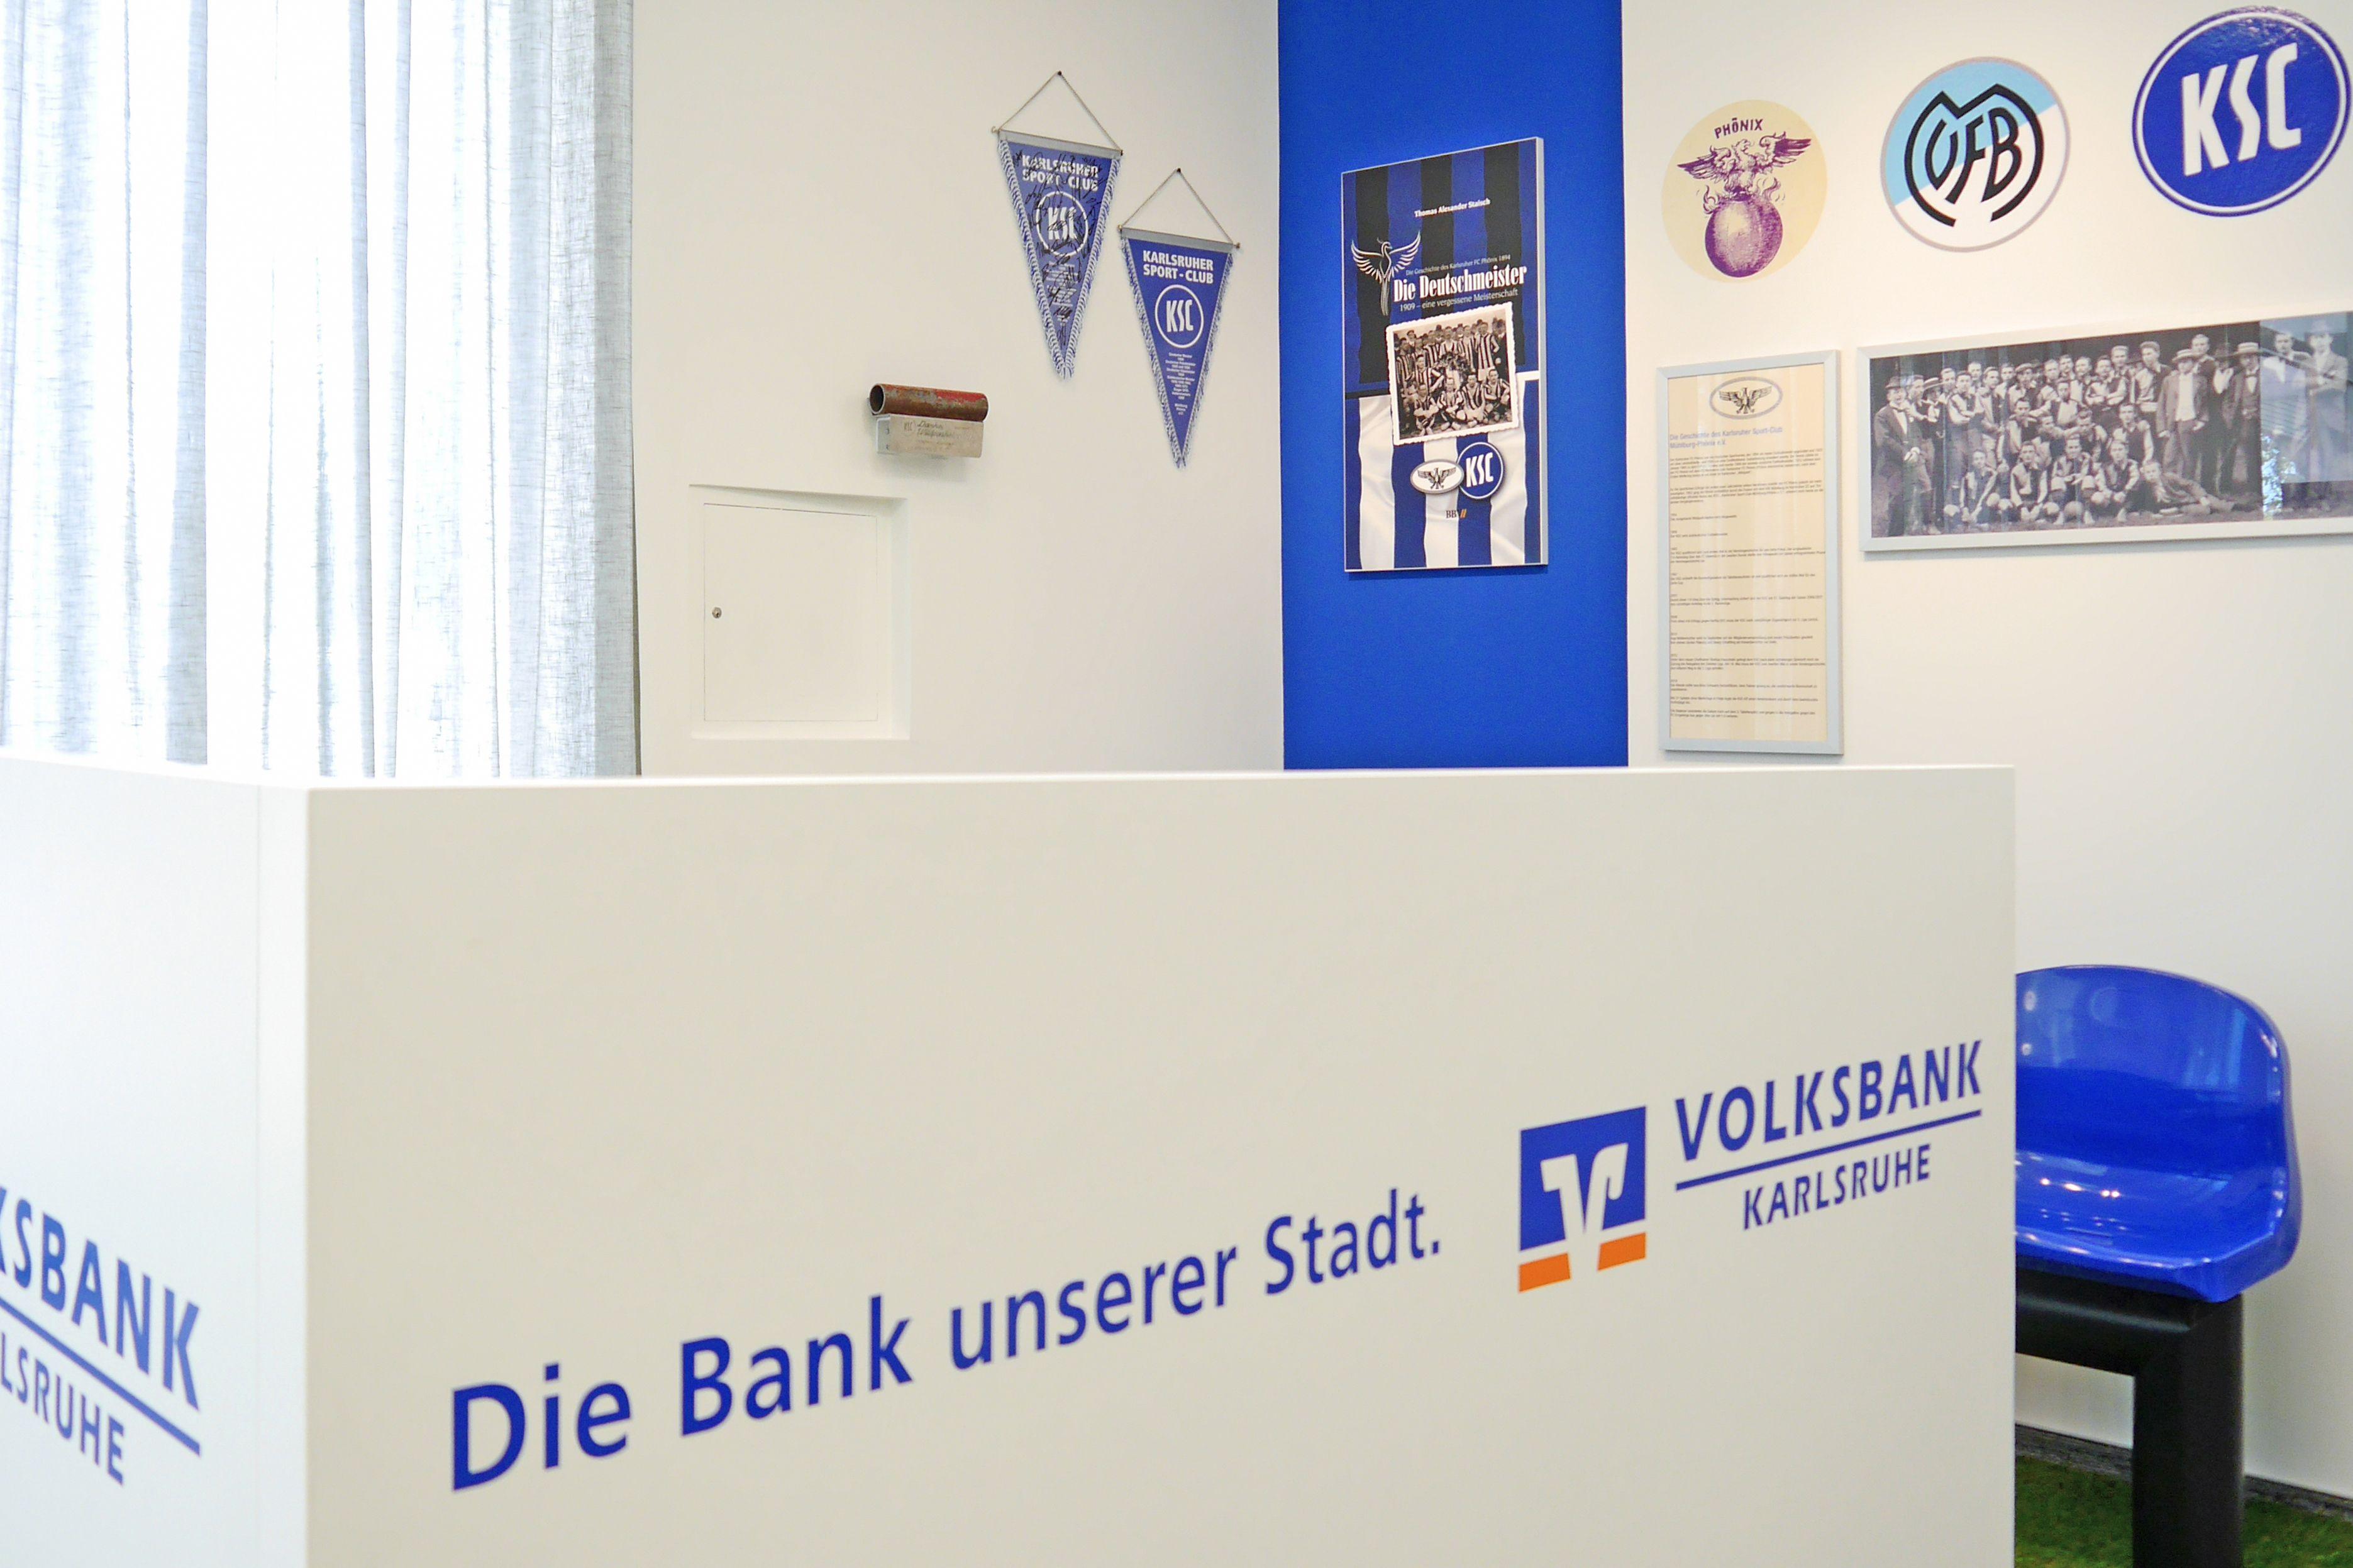 Volksbank Regionalfiliale Karlsruhe Muhlburg Karlsruhe Innenarchitektur Ergonomie Am Arbeitsplatz